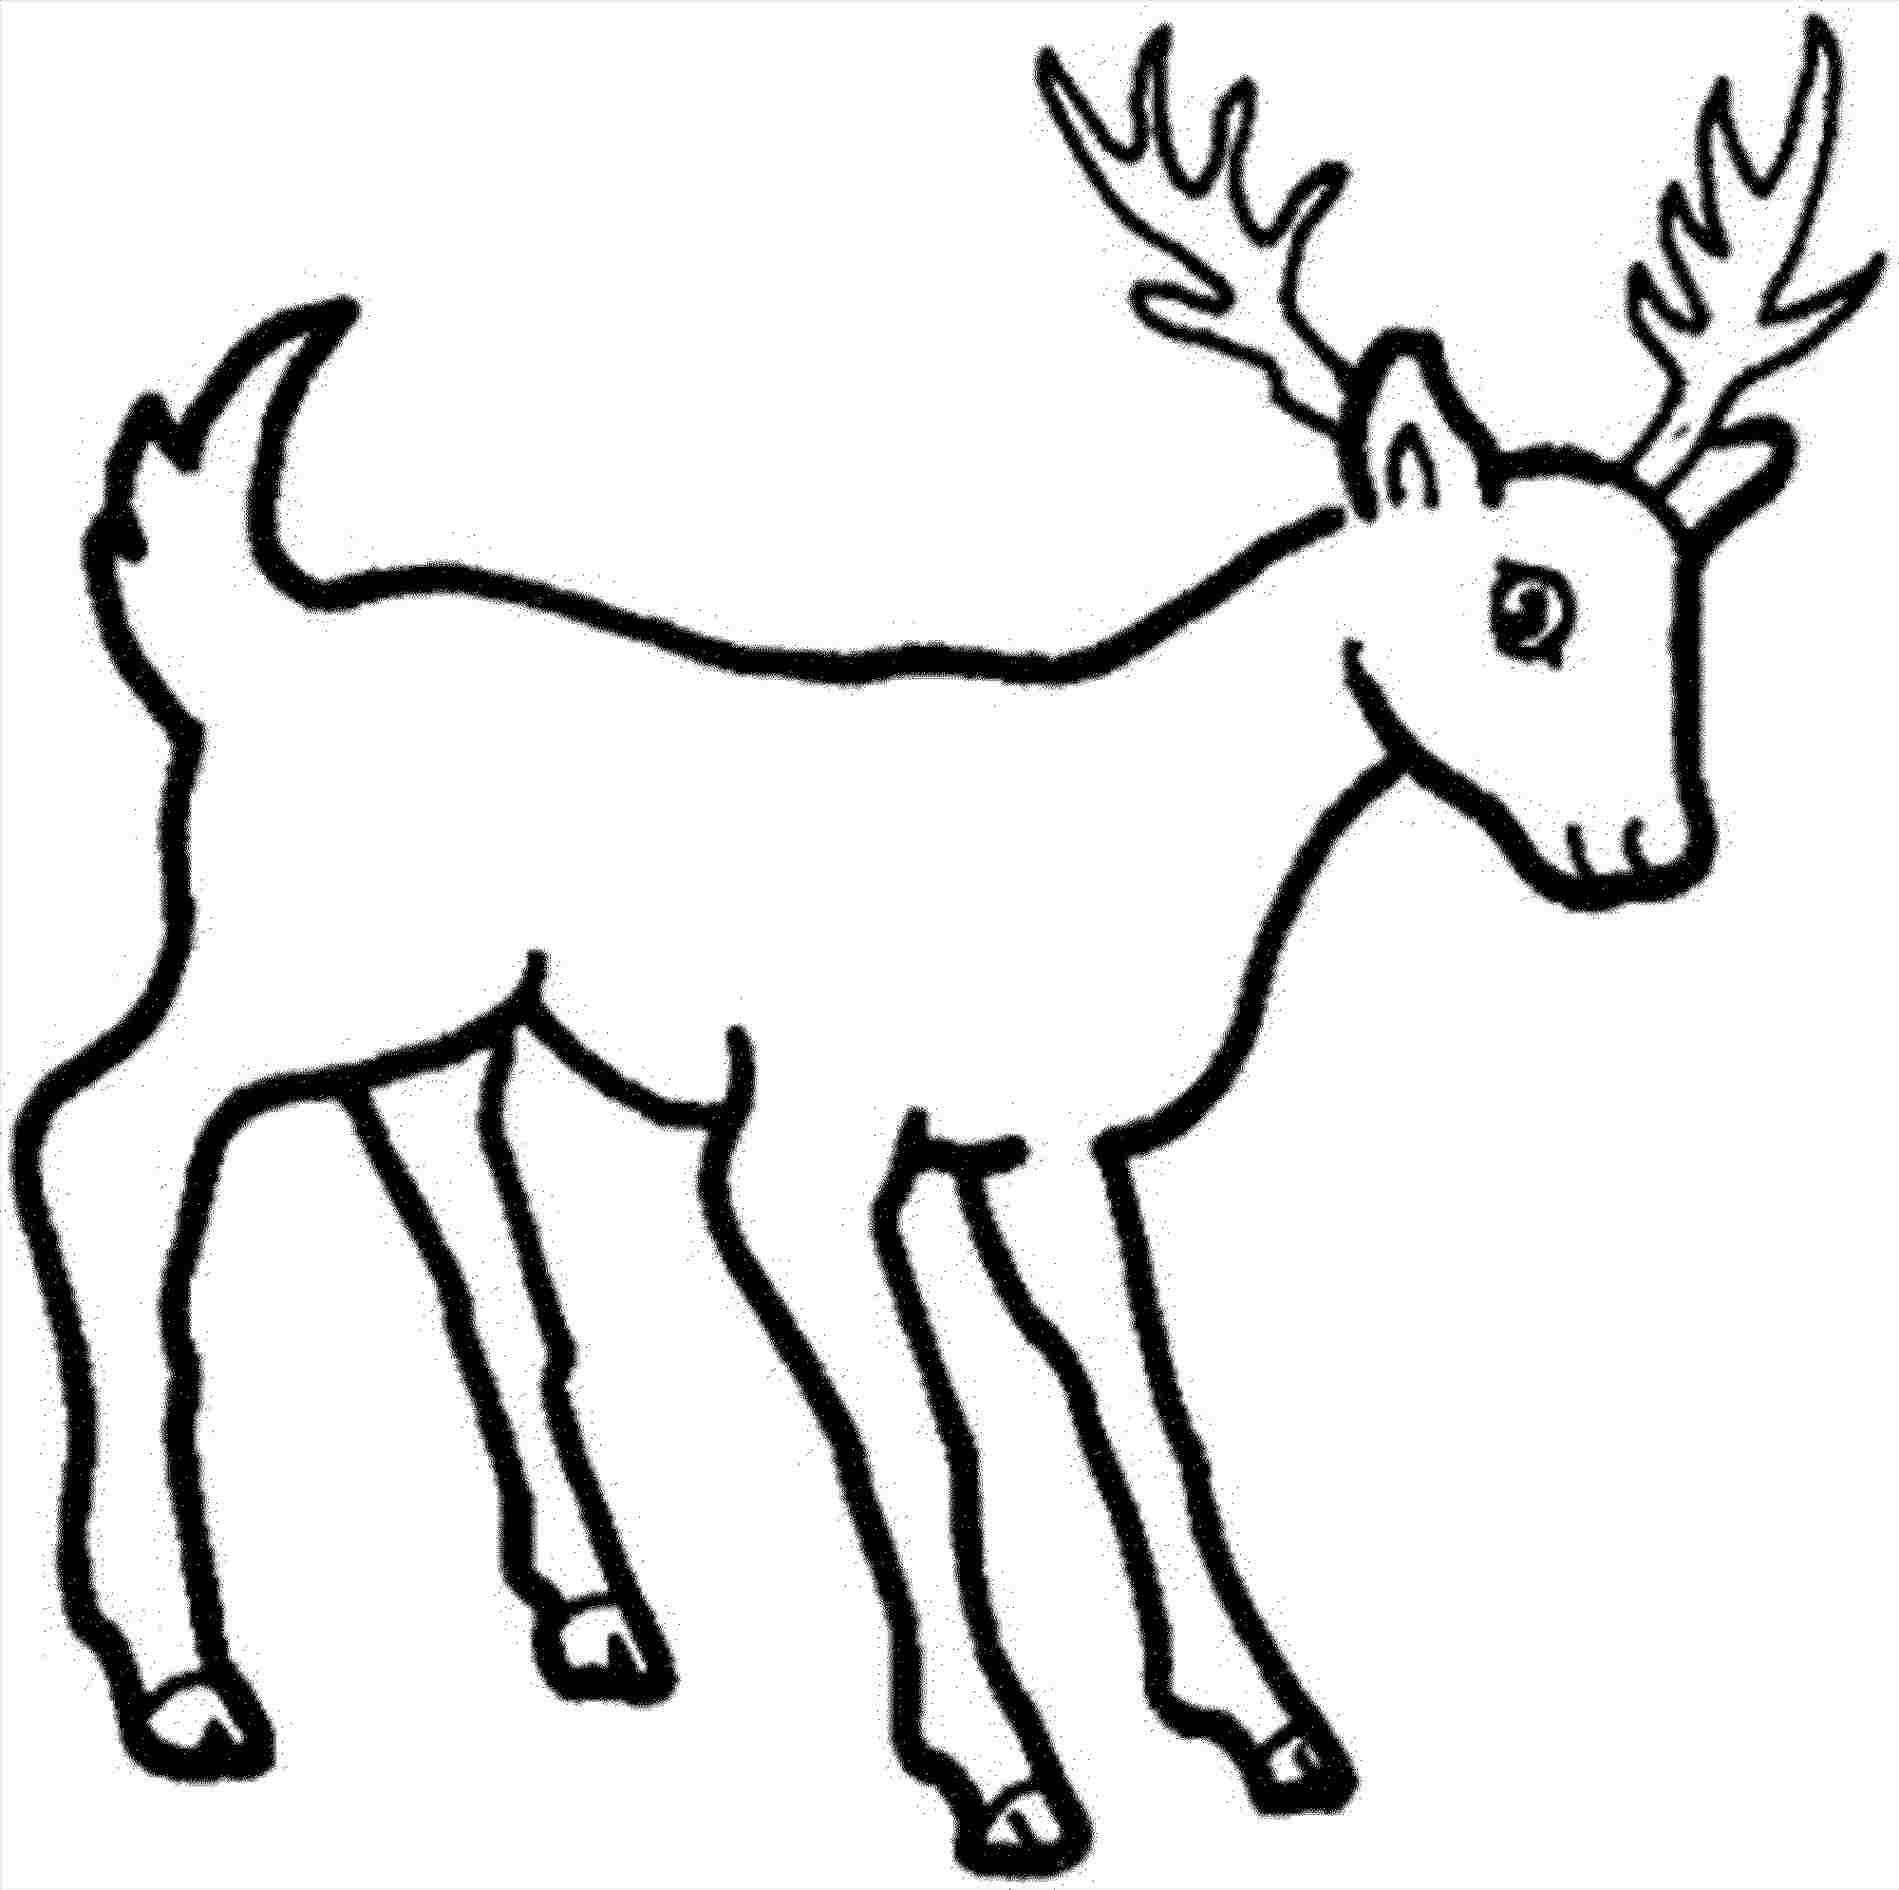 1899x1890 Easy To Draw Deer Cartoon